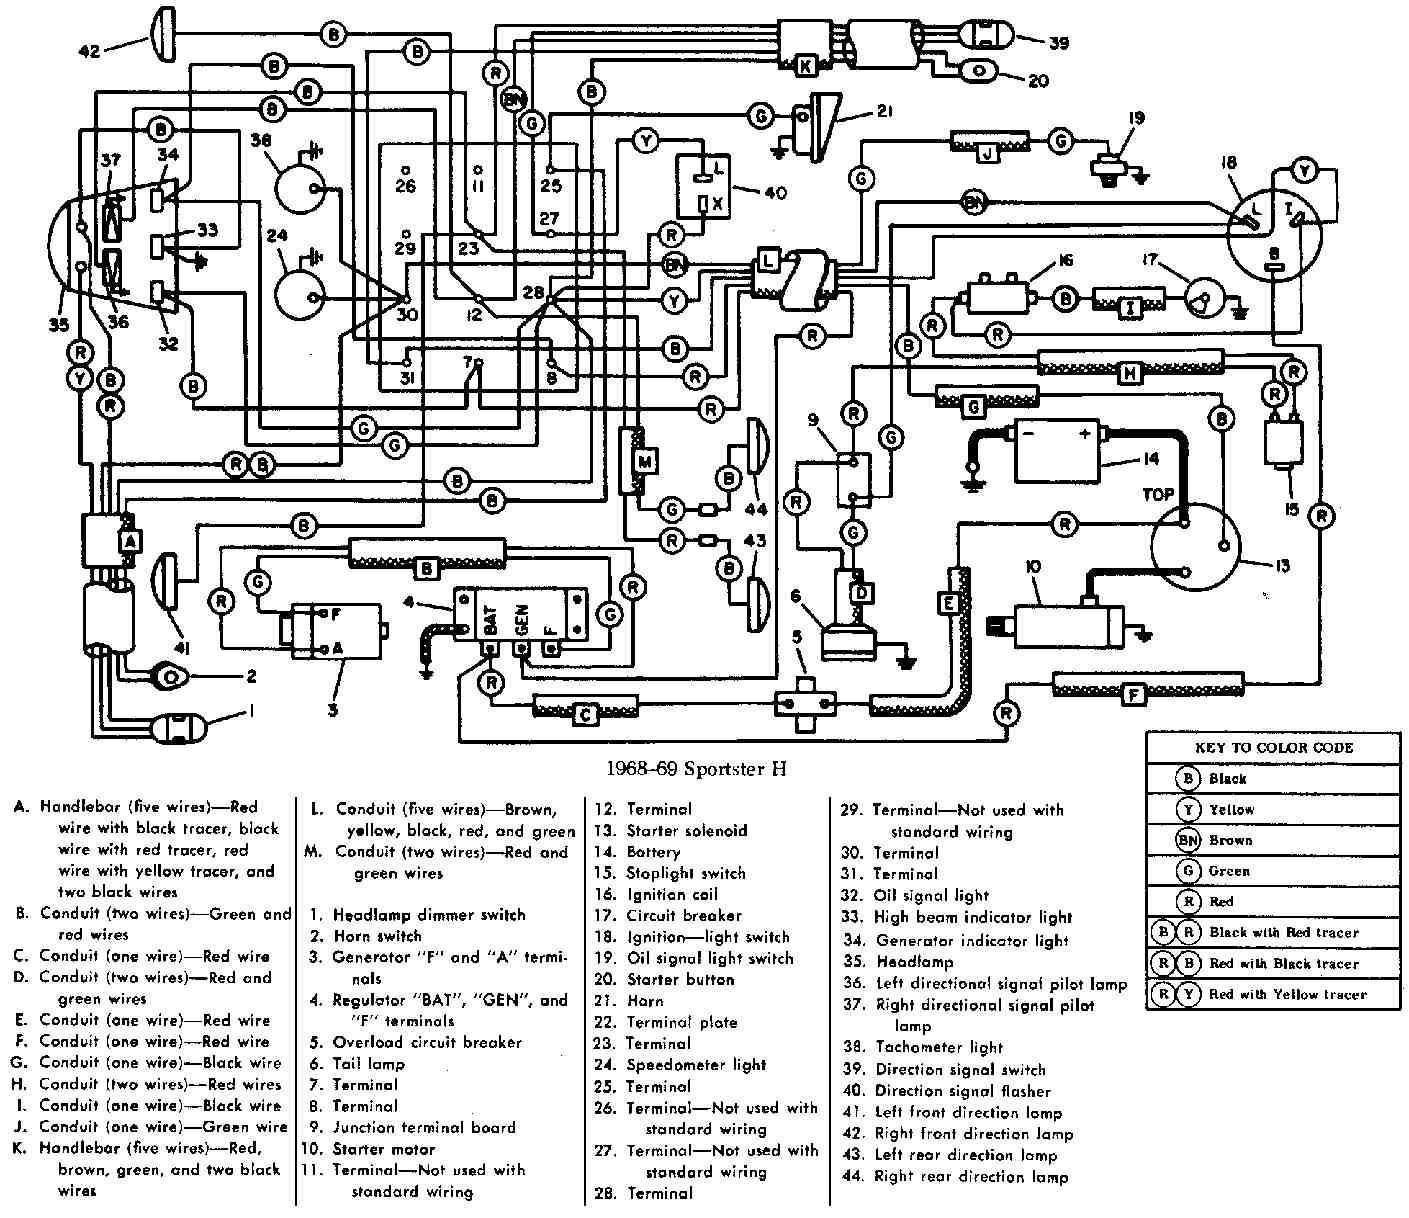 standard turn signal wiring diagram wire center \u2022 motorcycle led turn signal wiring diagram harley turn signal wiring diagram wiring diagram image rh mainetreasurechest com simple turn signal diagram single filament turn signal wiring diagram